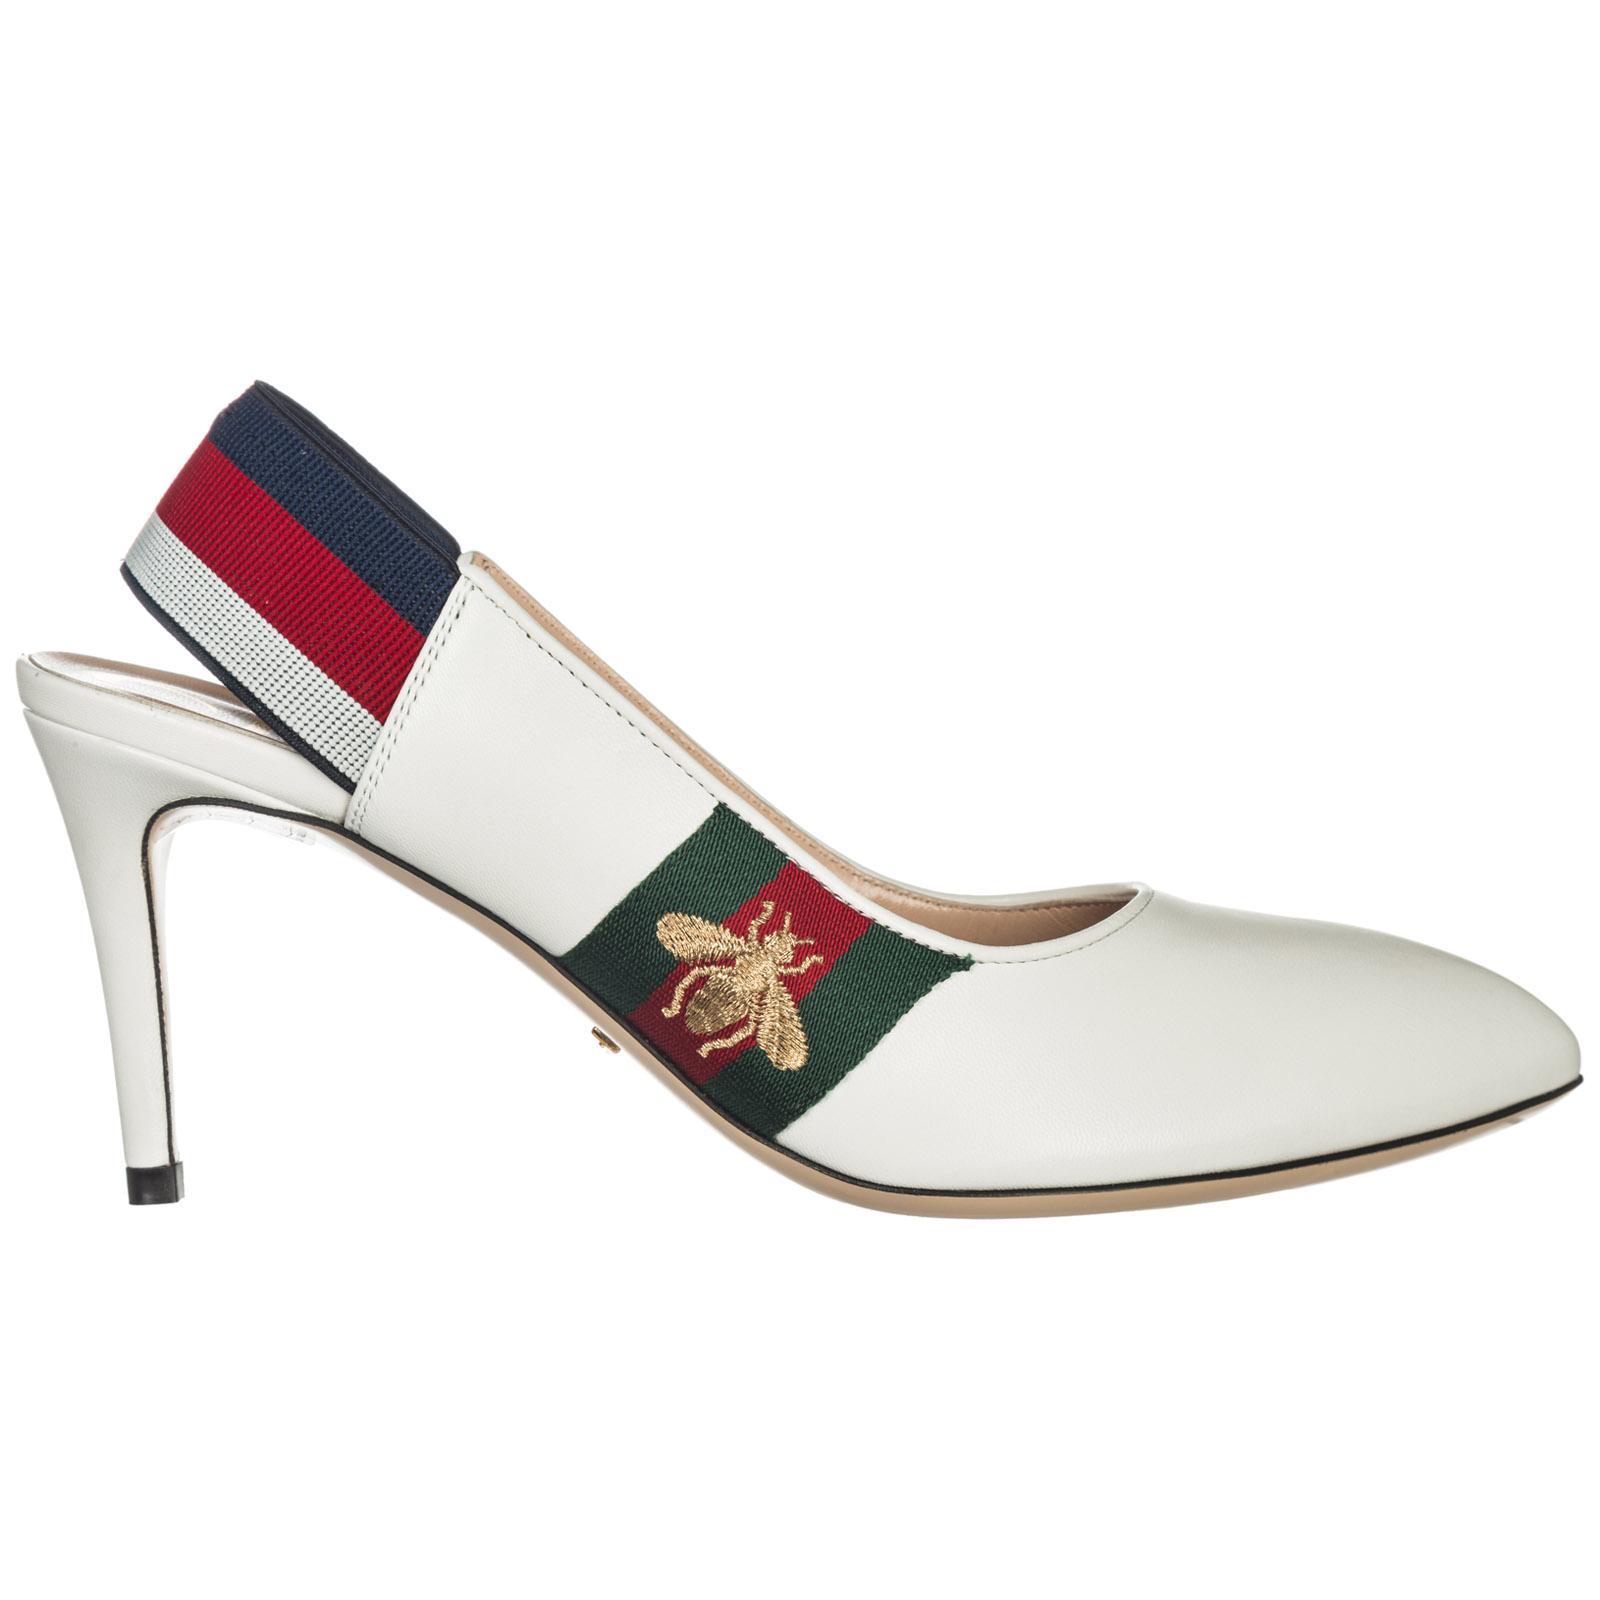 c6e6530ef01e Gucci. Women s Leather Pumps Court Shoes High Heel